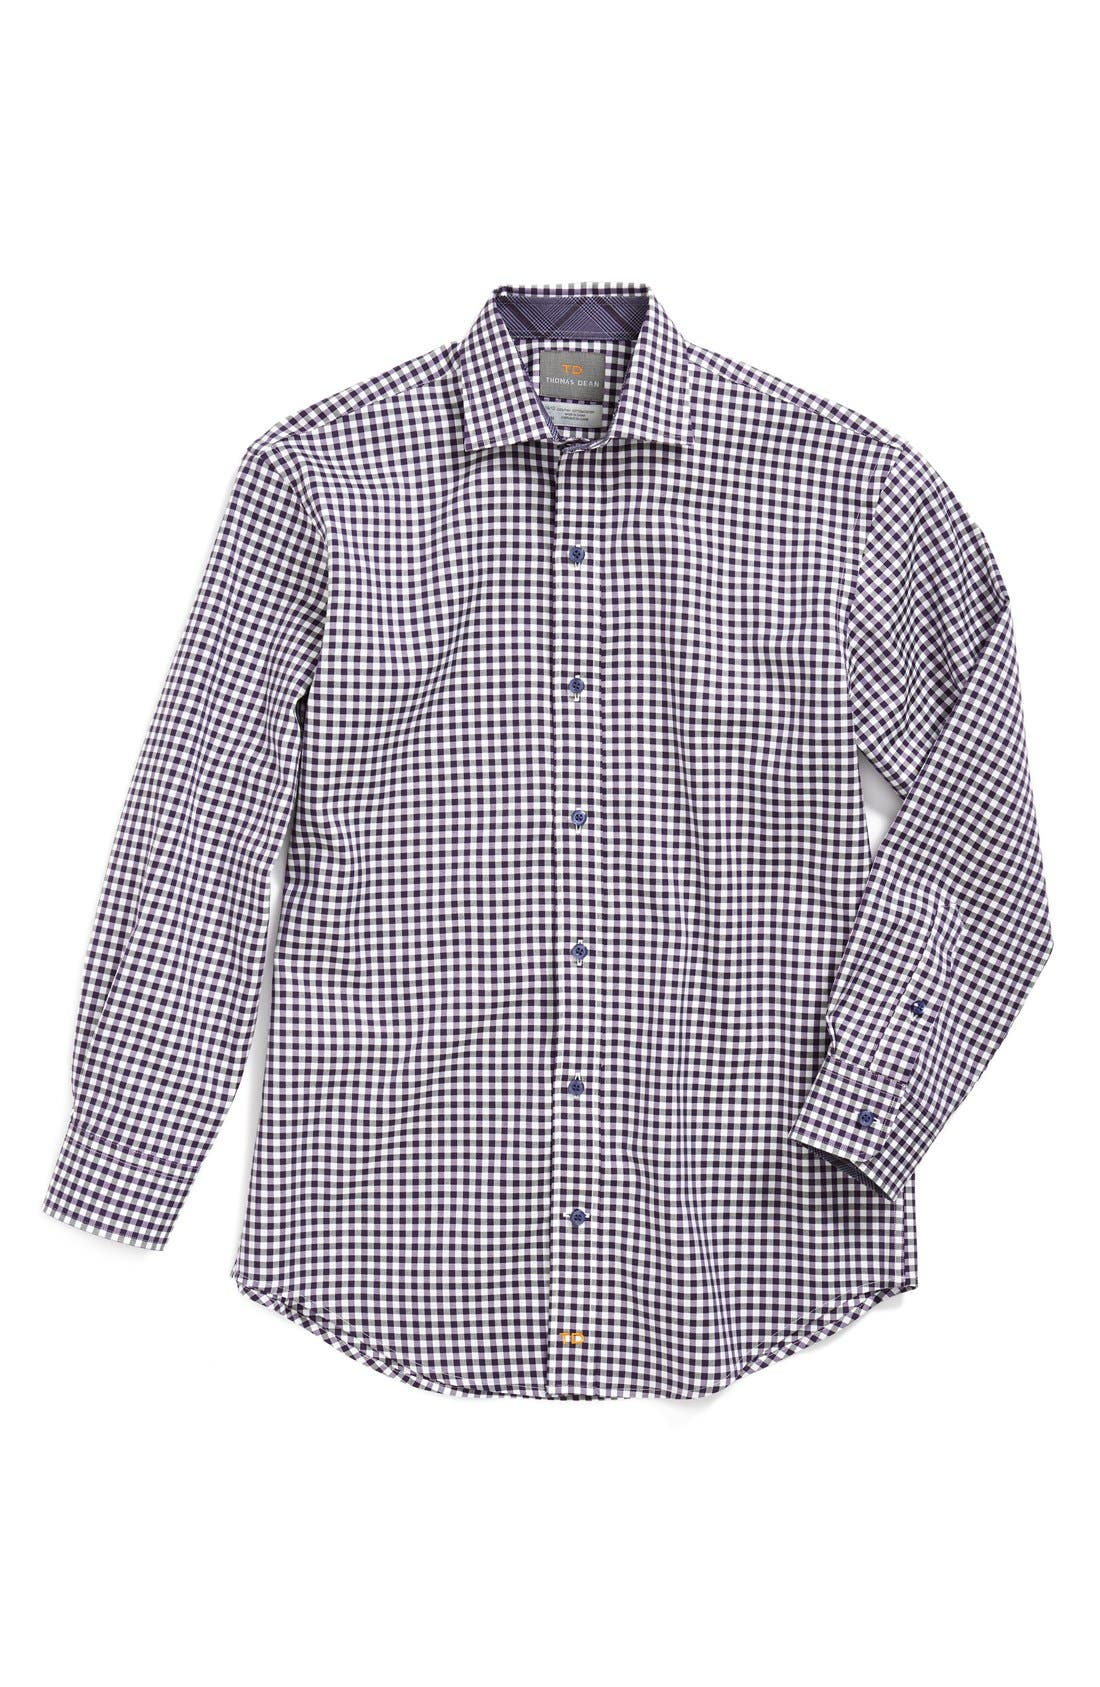 Alternate Image 1 Selected - Thomas Dean Gingham Dress Shirt (Big Boys)